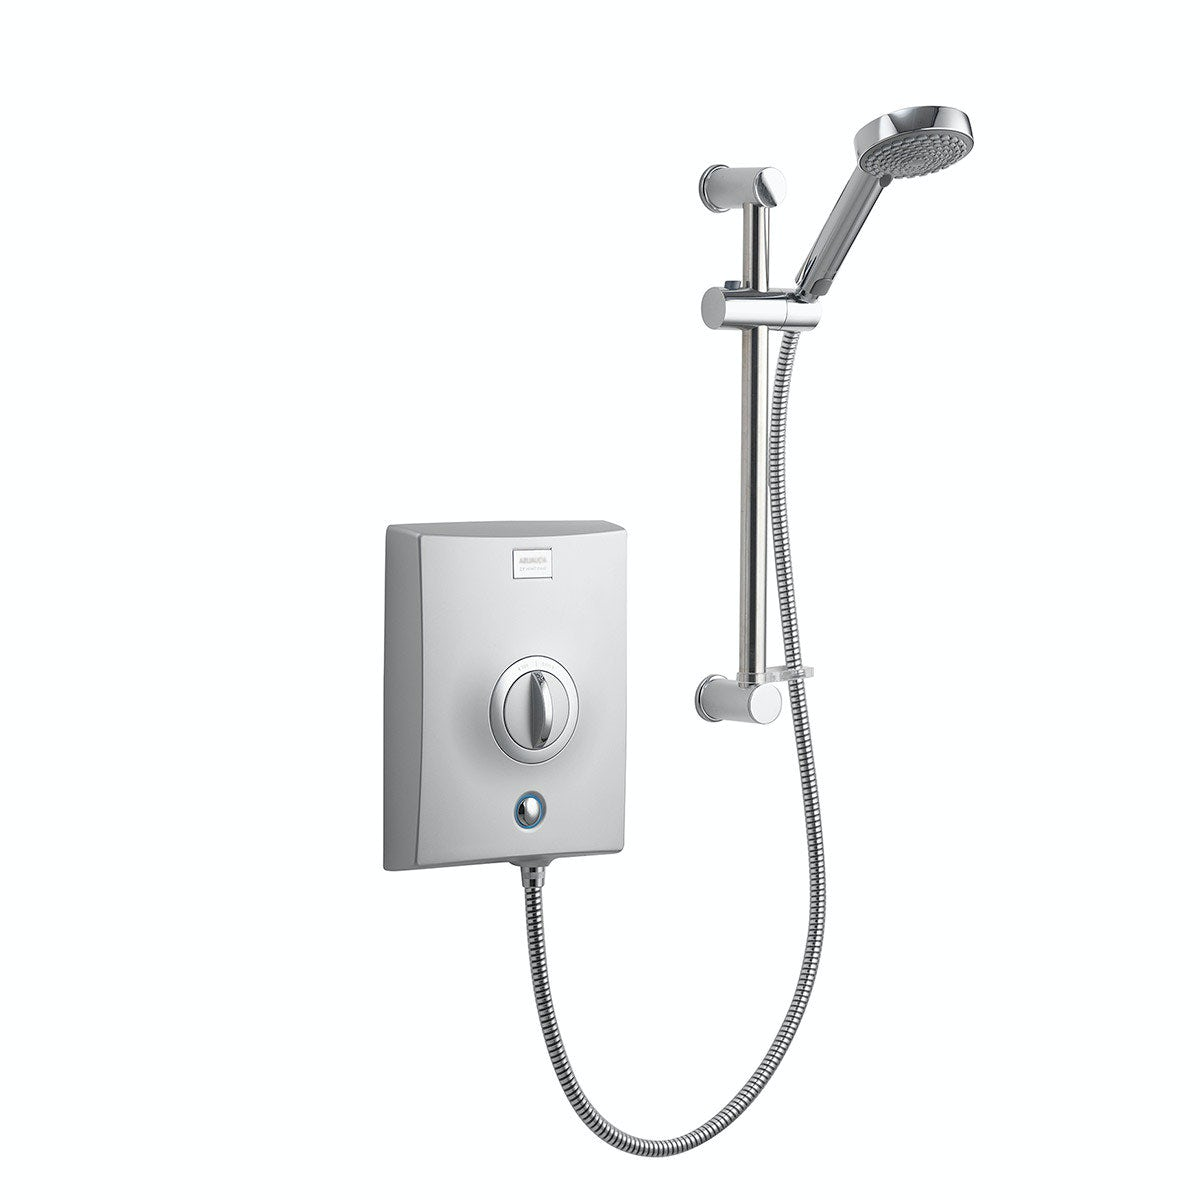 Aqualisa quartz electric shower 8.5kw - Sold by Victoria Plum